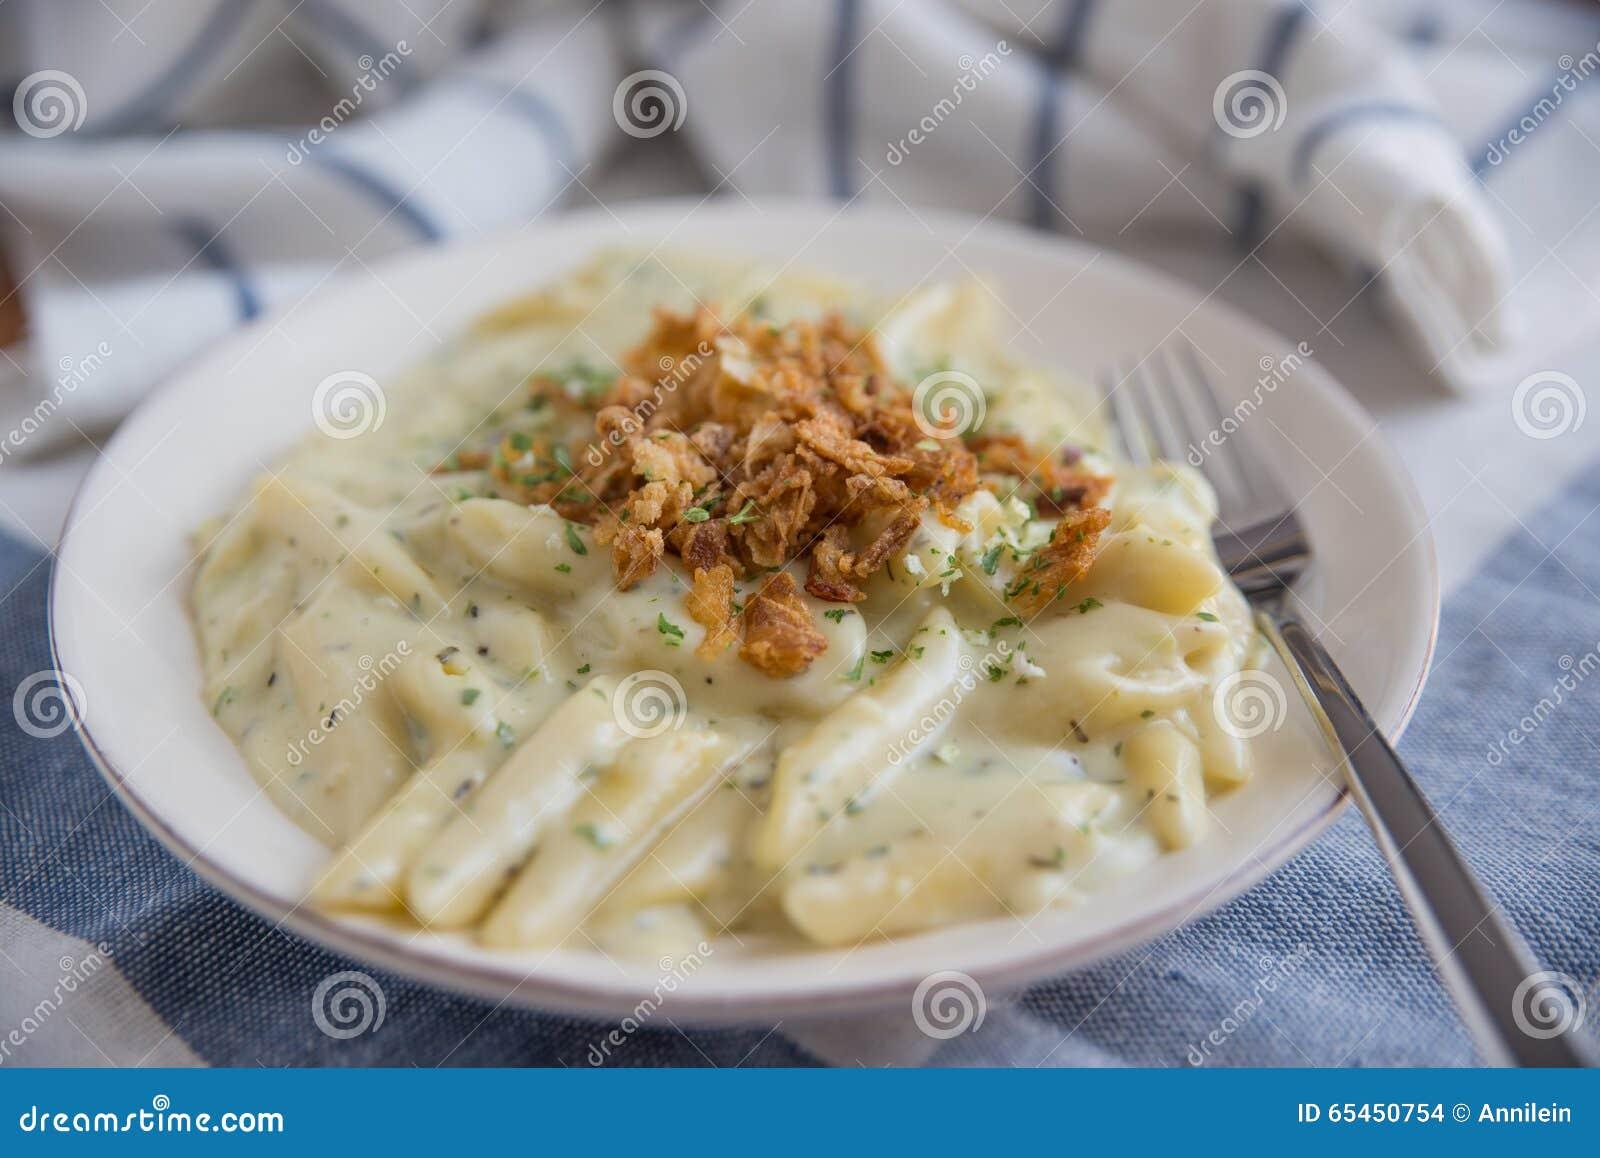 Home made mac and cheese